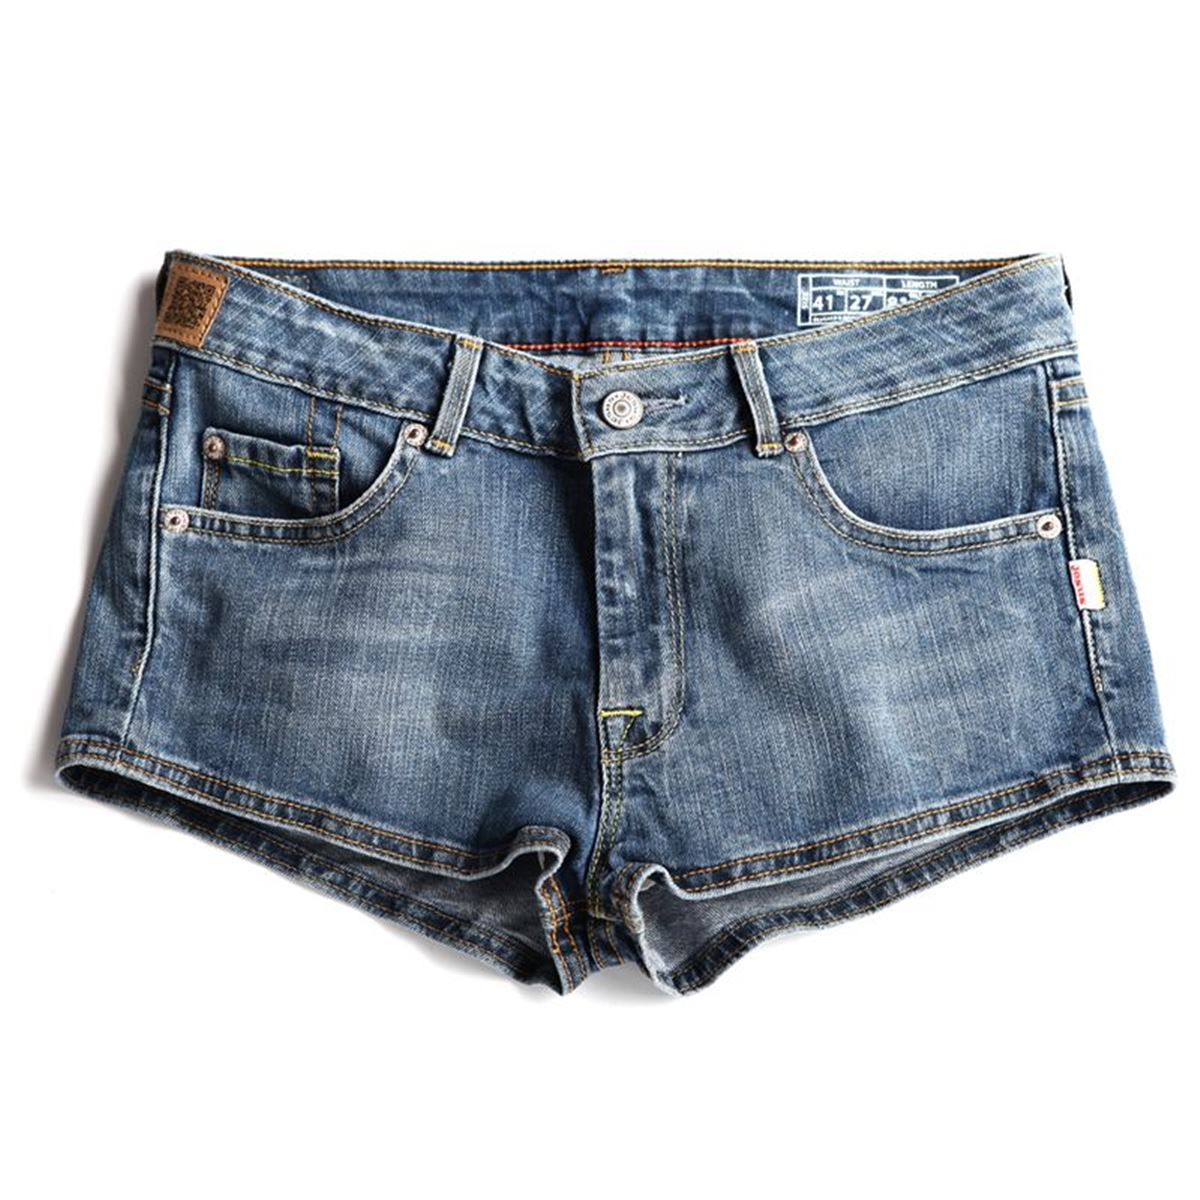 Pantaloncini Jesus Jeans donna-4001R40